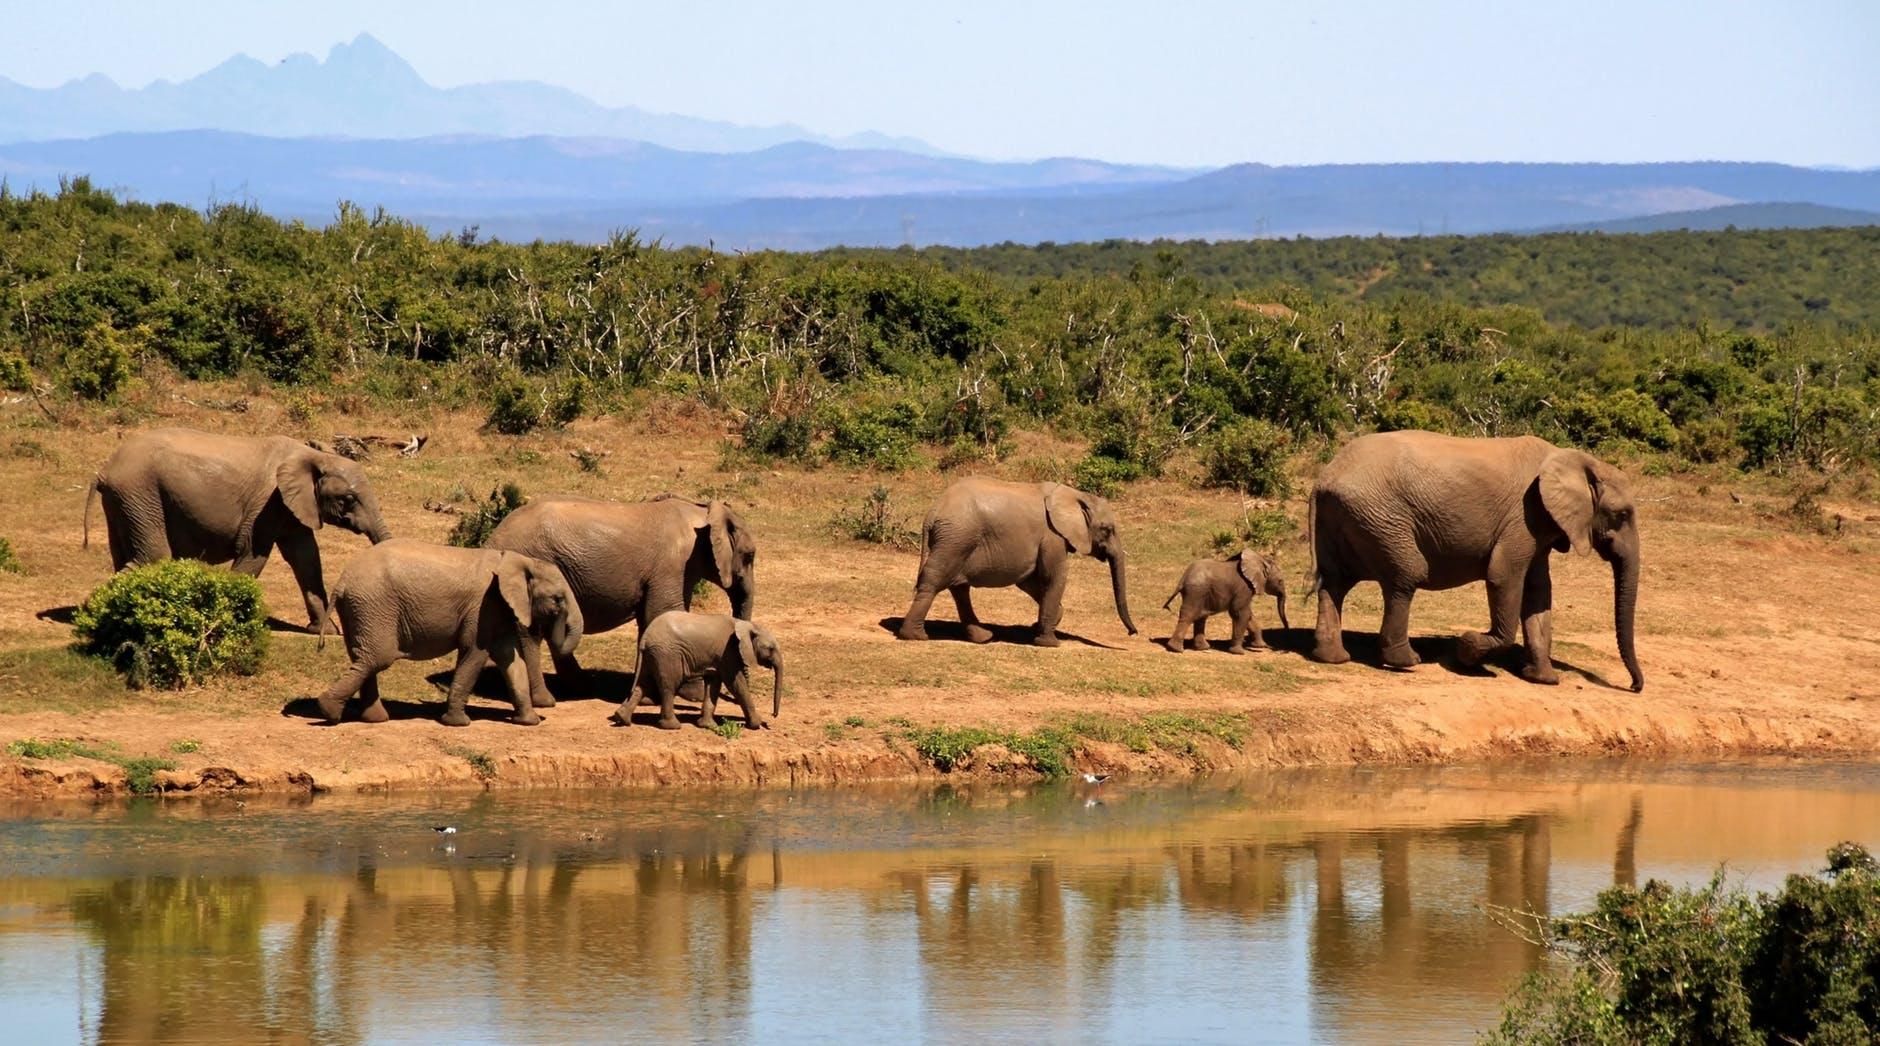 elephant-herd-of-elephants-african-bush-elephant-africa-59989.jpeg